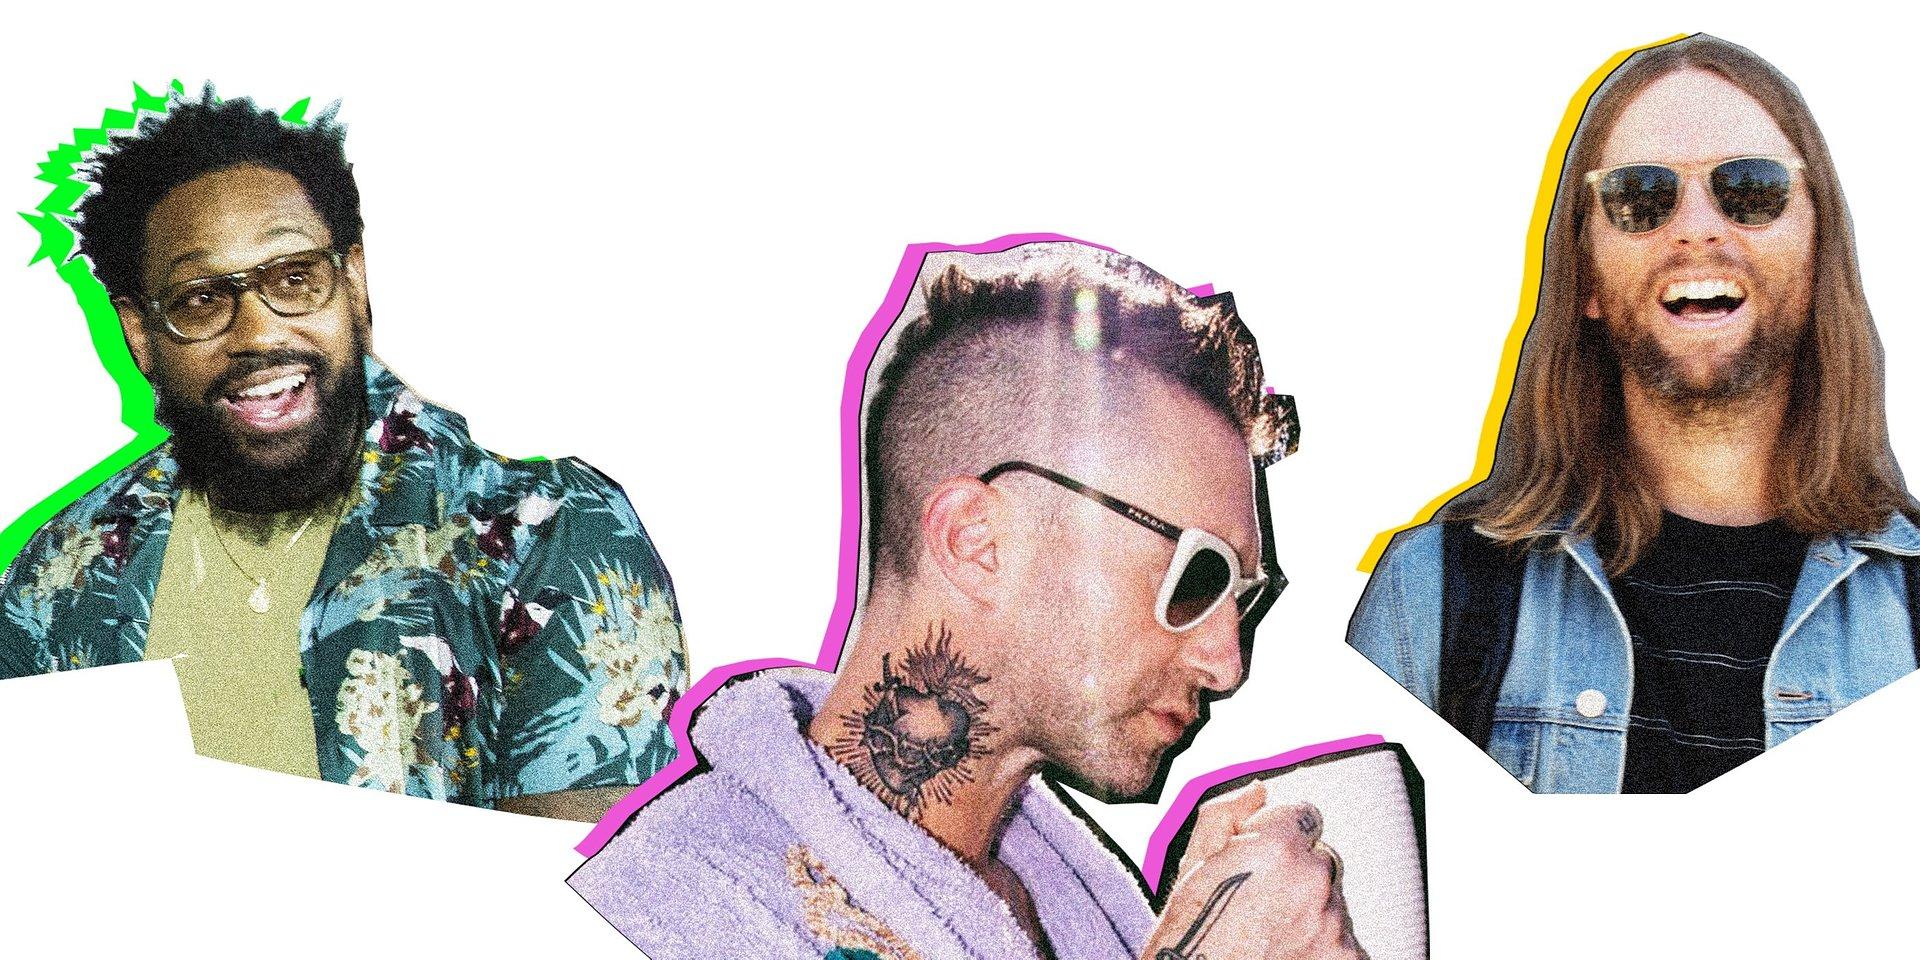 """Nobody's Love"" - kolejny hit od Maroon 5!"